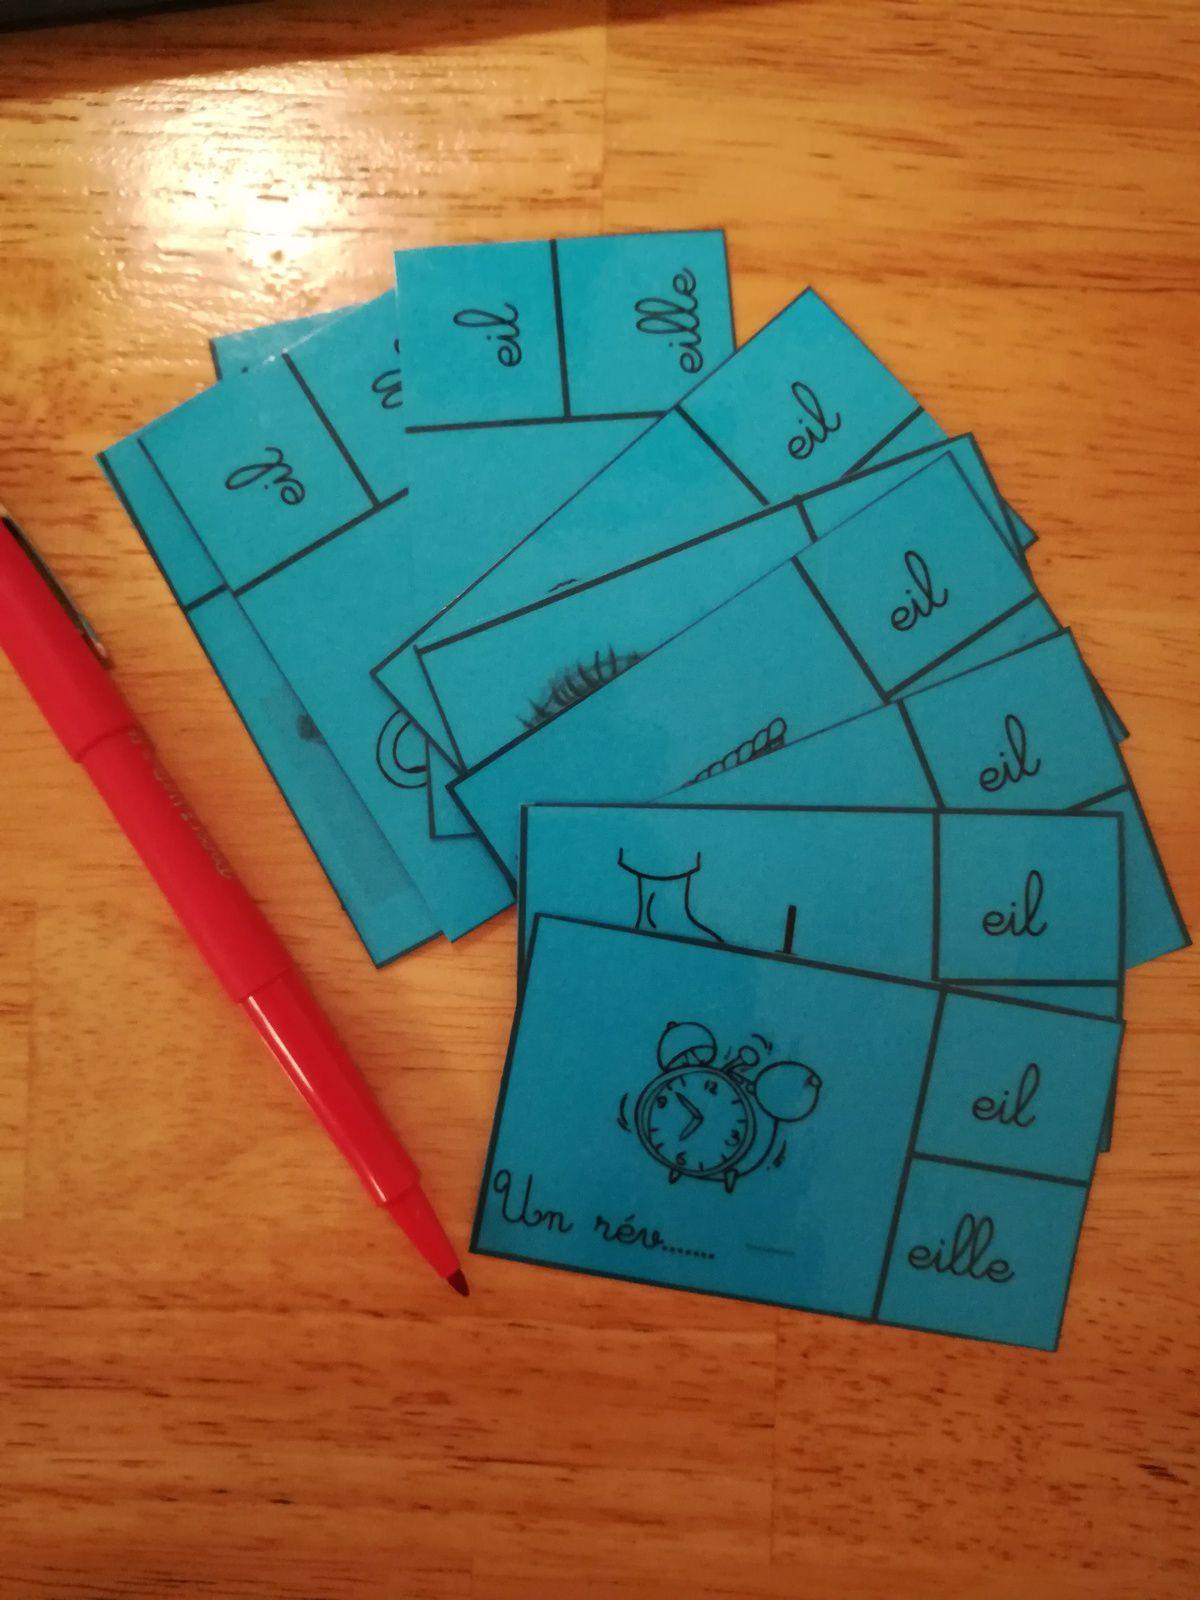 Orthographe CE2 - Cartes à pinces - 👂 [ill]